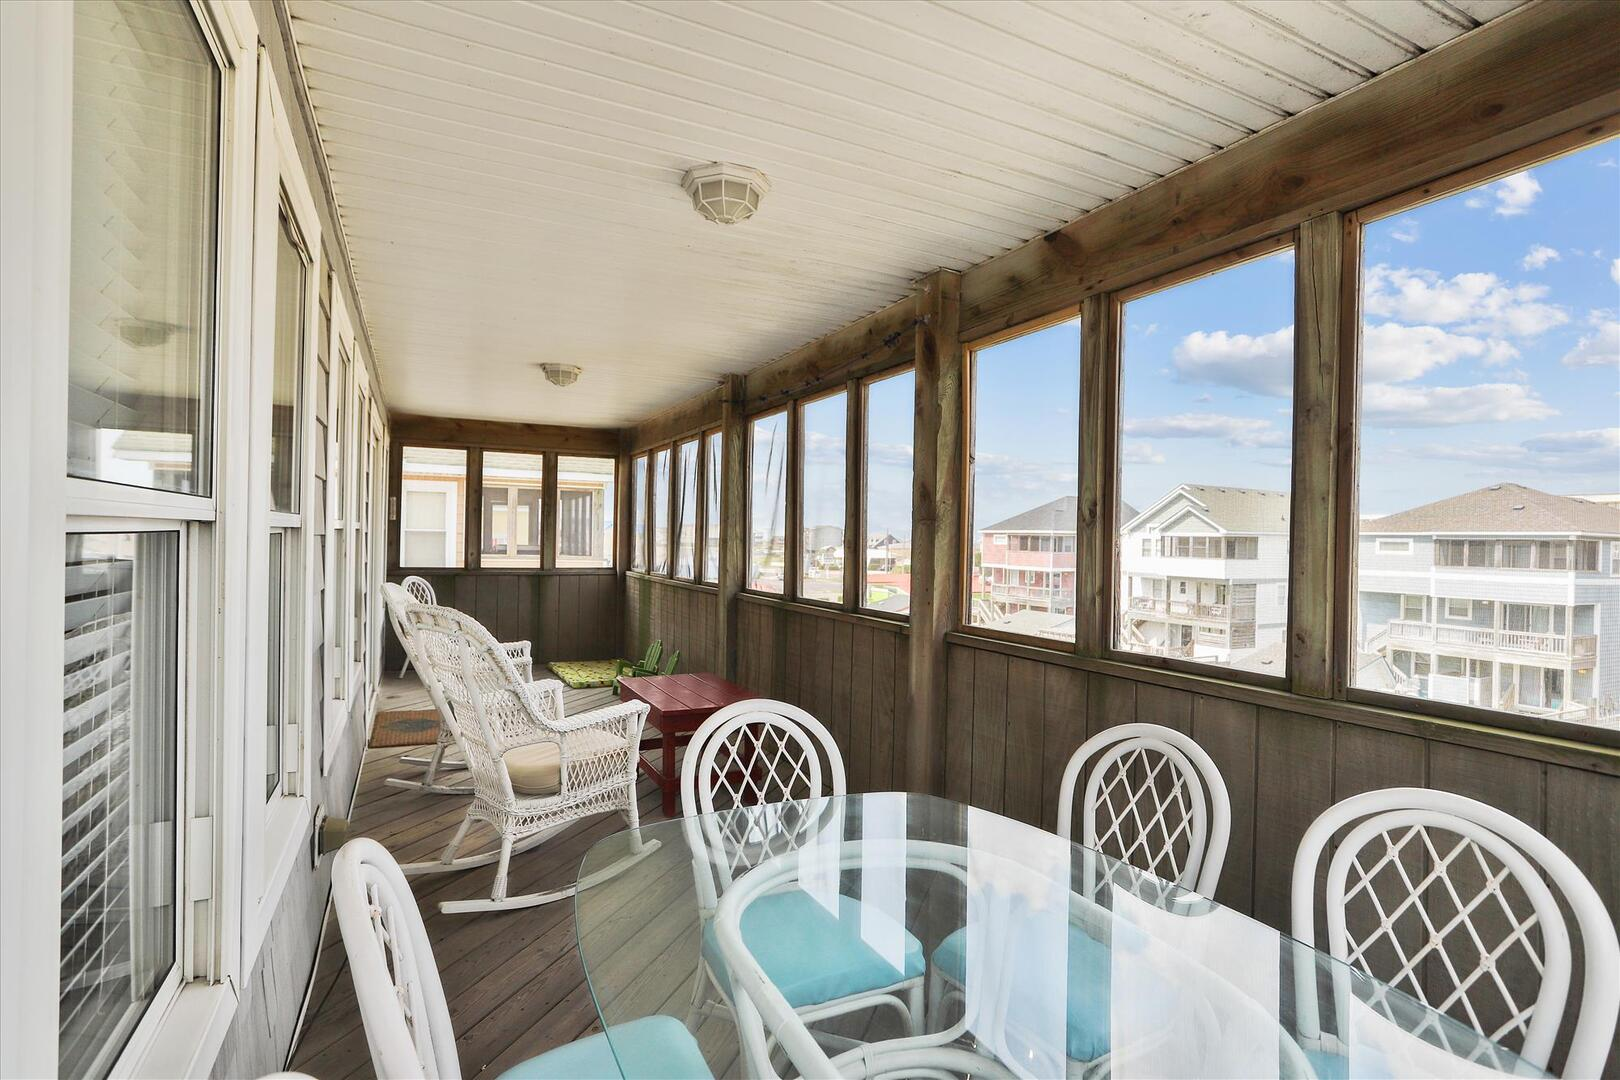 Upper/Main Level,Screened Porch,